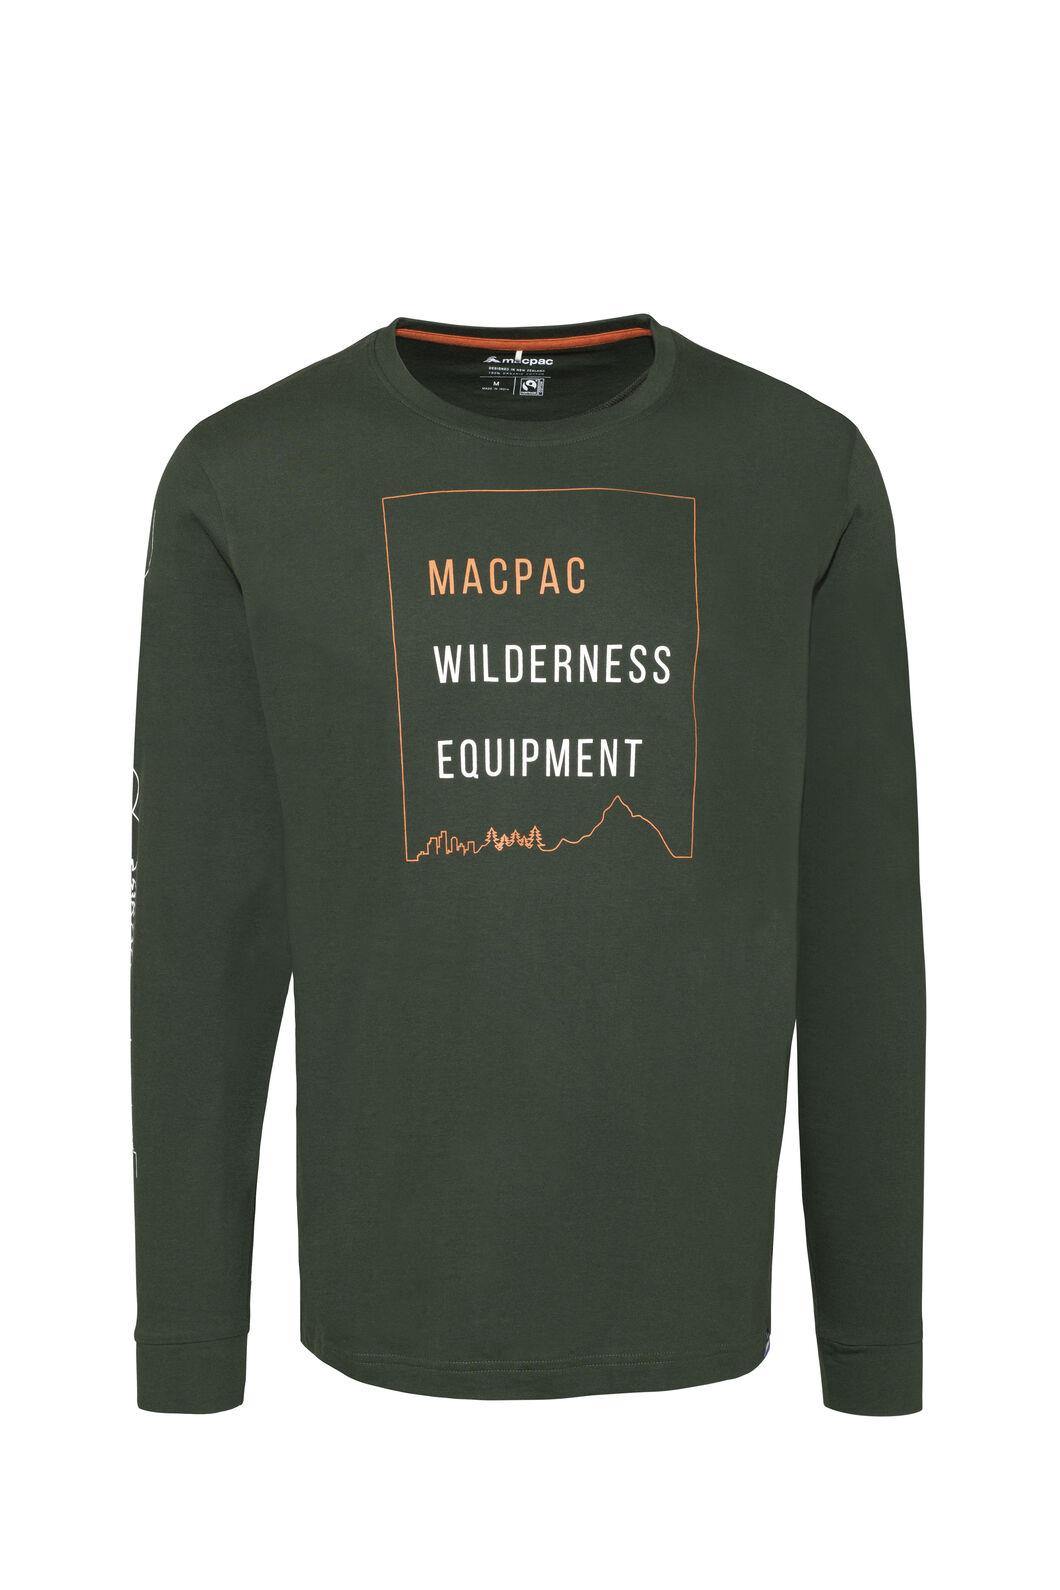 Macpac Wilderness Equipment Fairtrade Organic Cotton Long Sleeve Tee — Men's, Kombu Green, hi-res